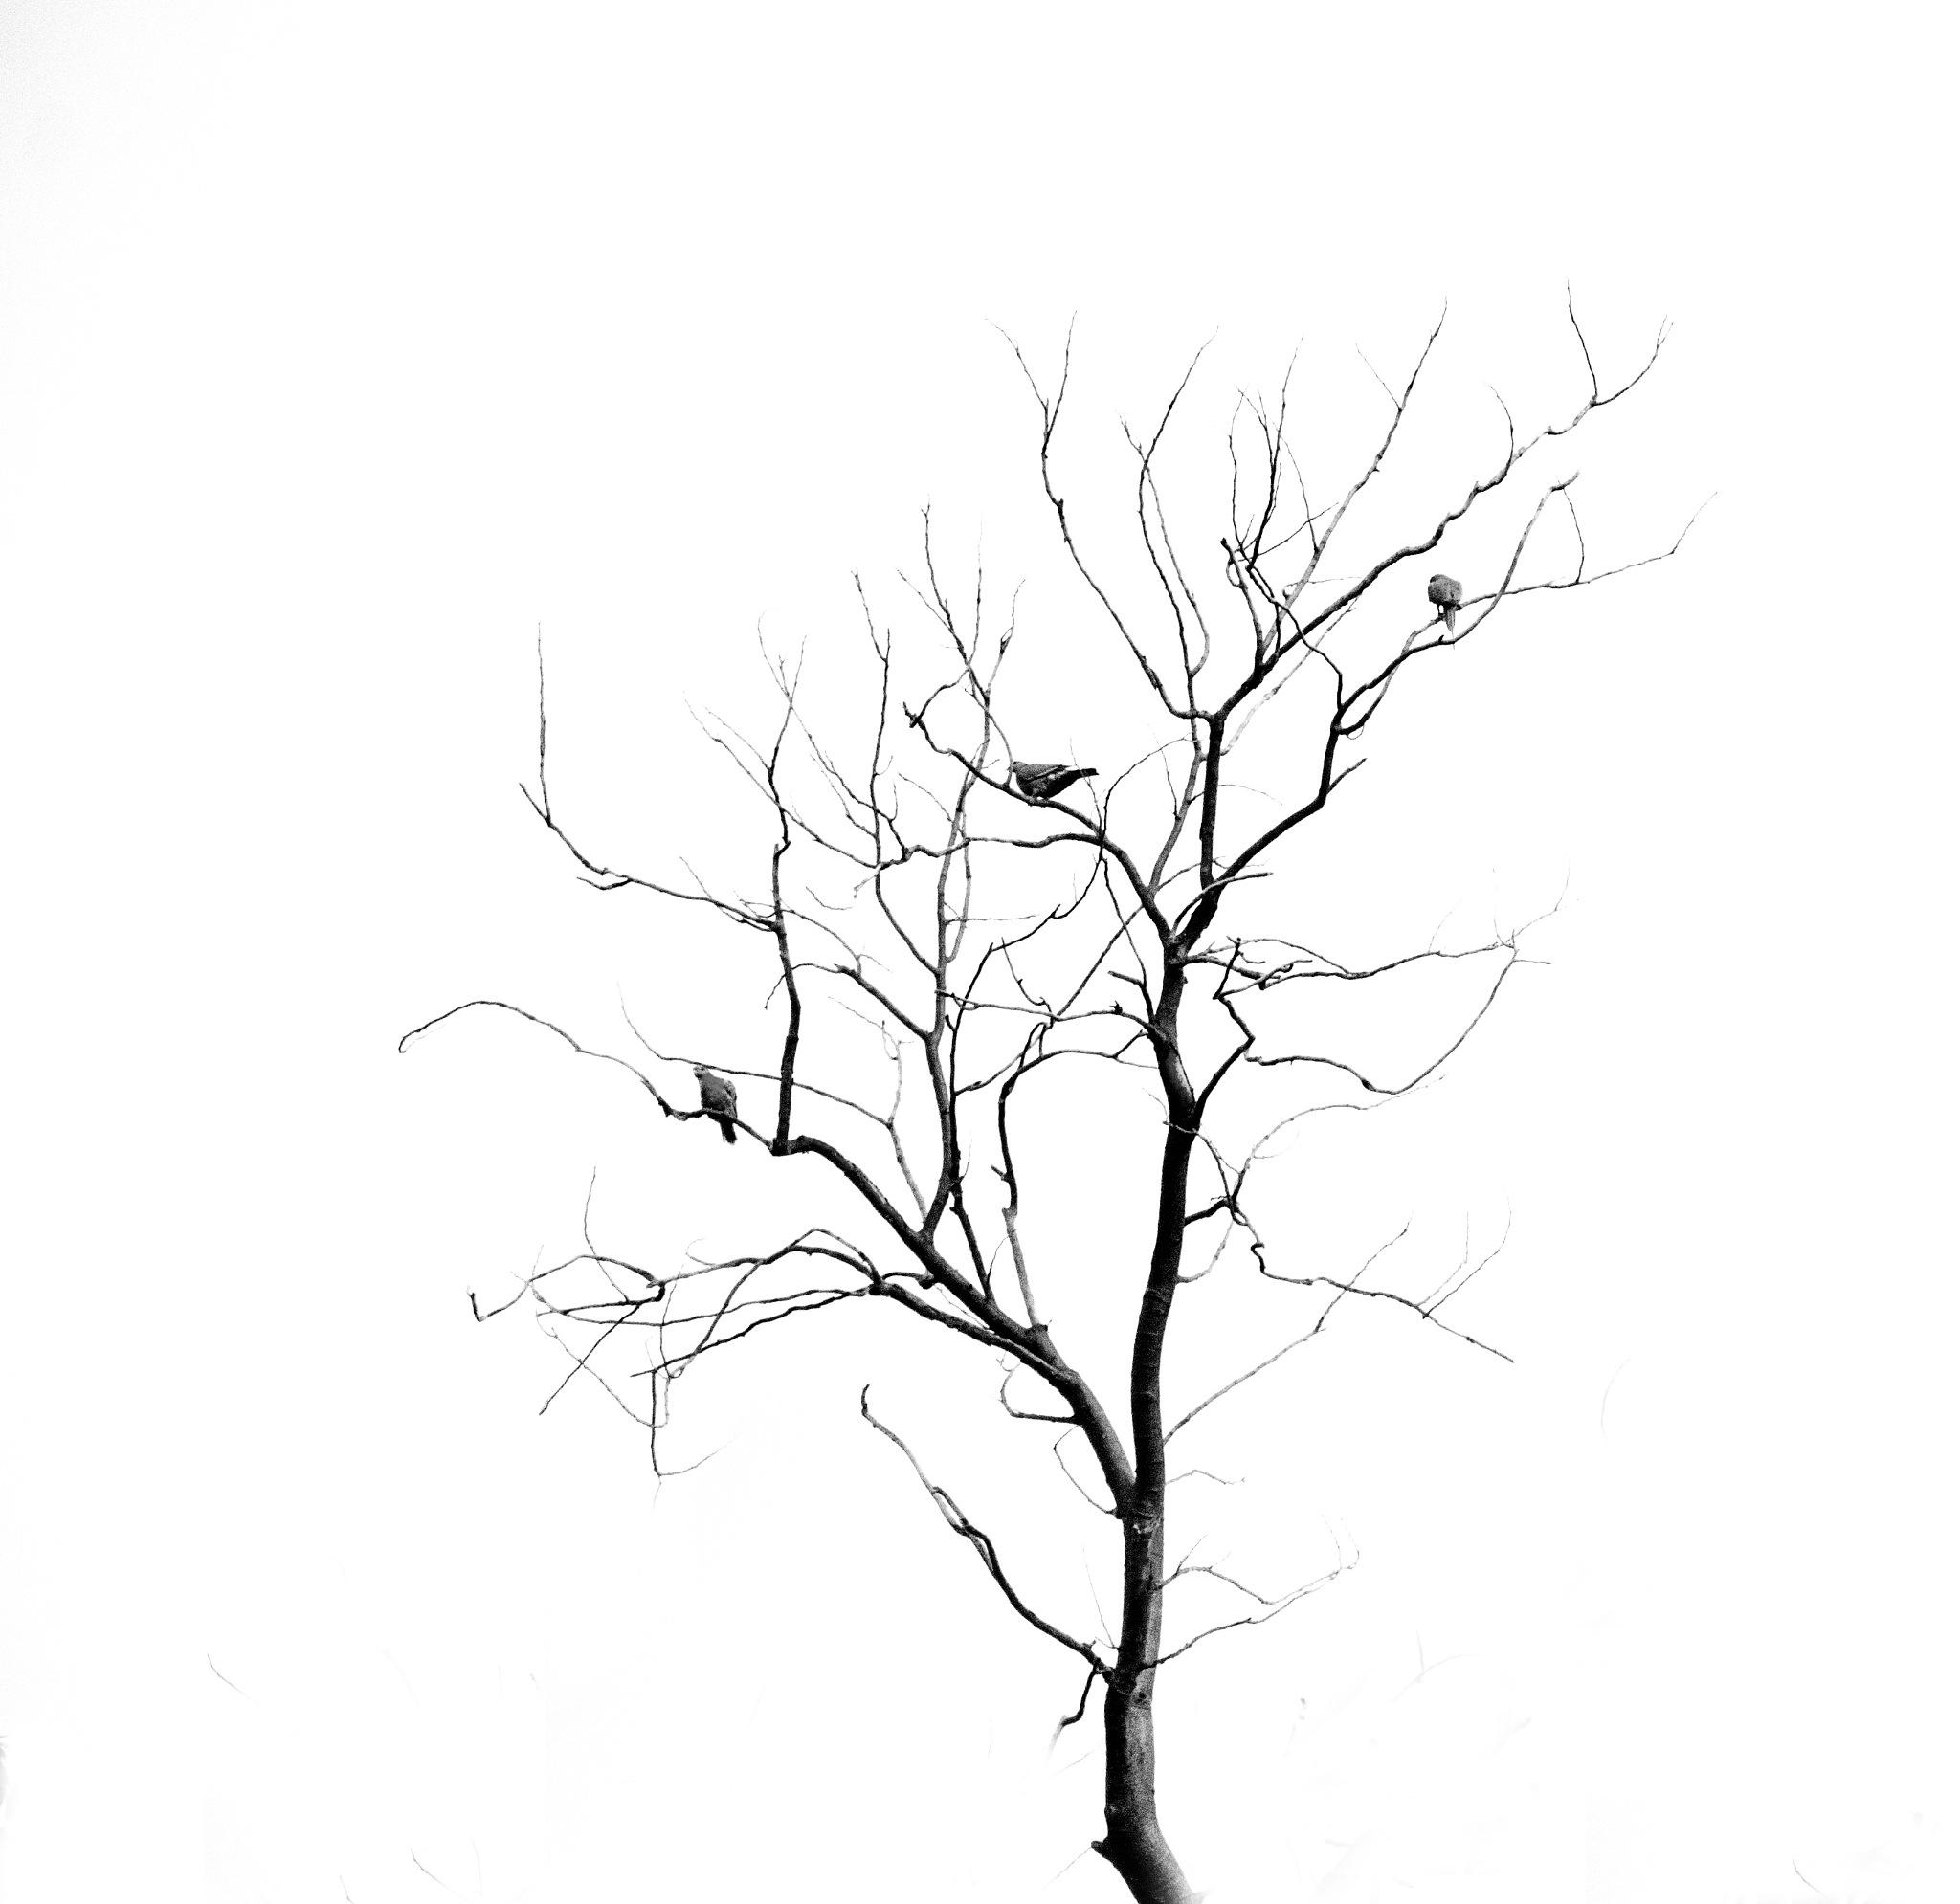 Tree and birds by marokkyprianou